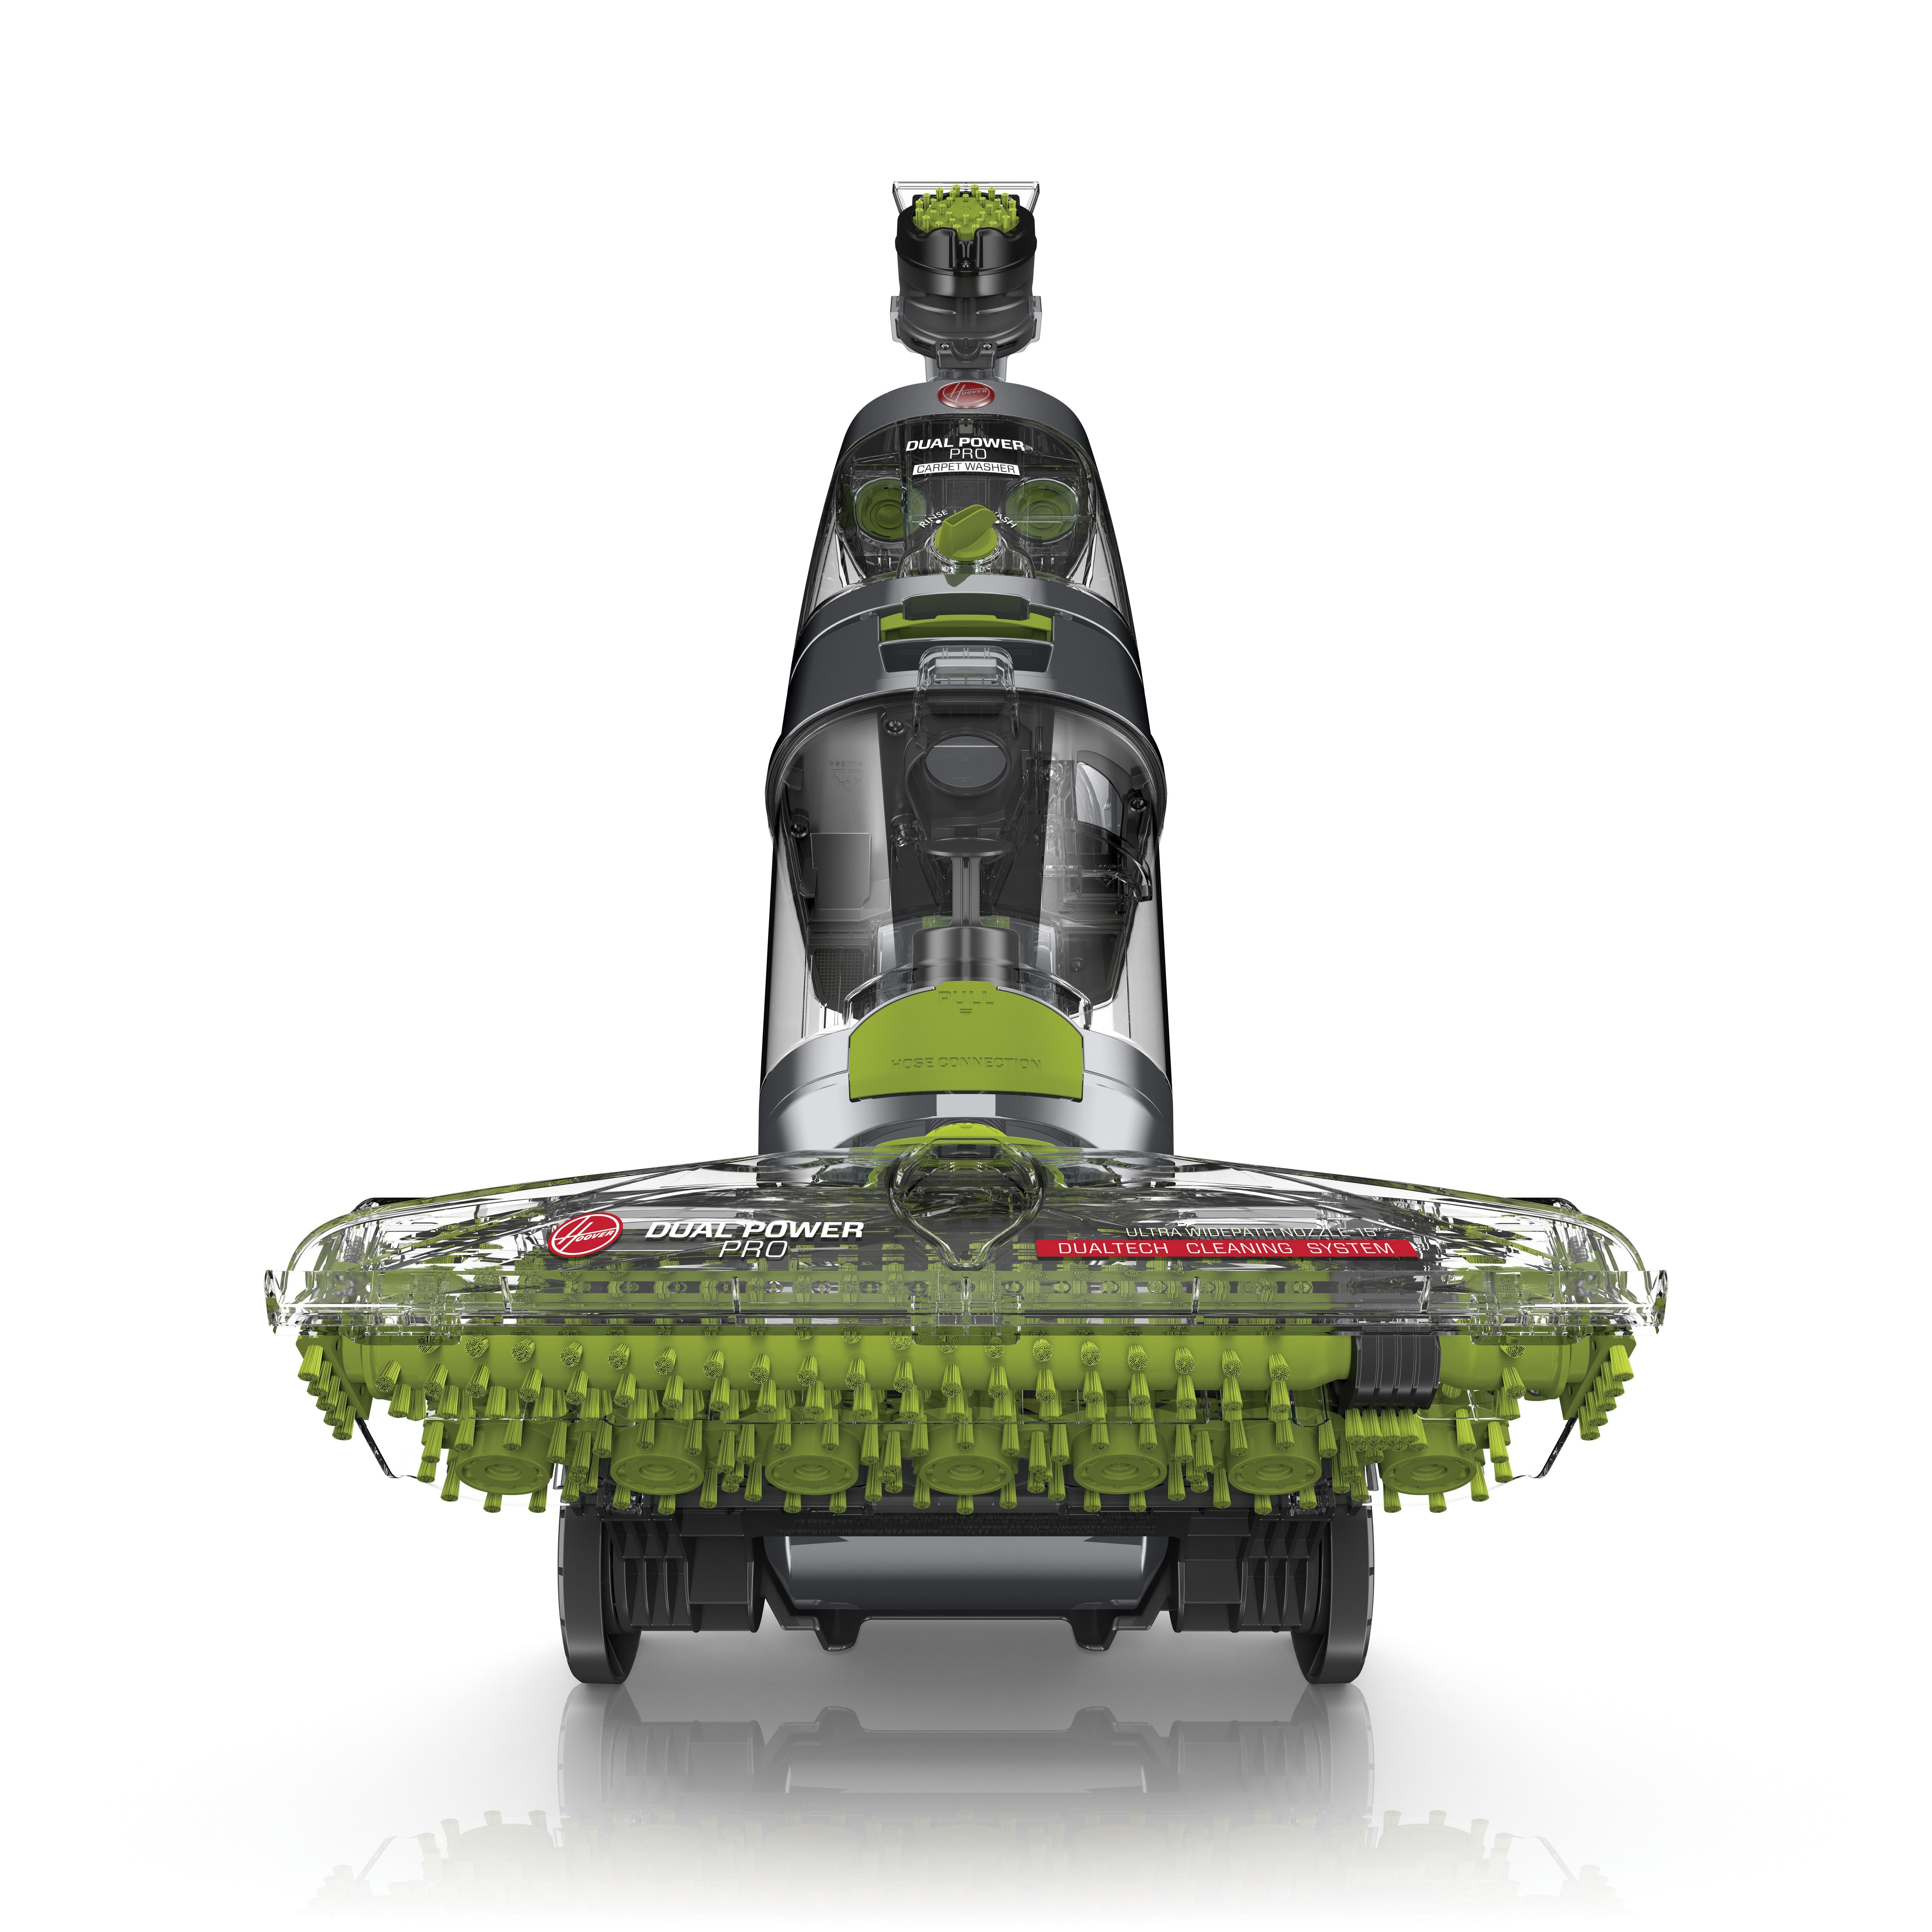 Dual Power Pro Carpet Cleaner2